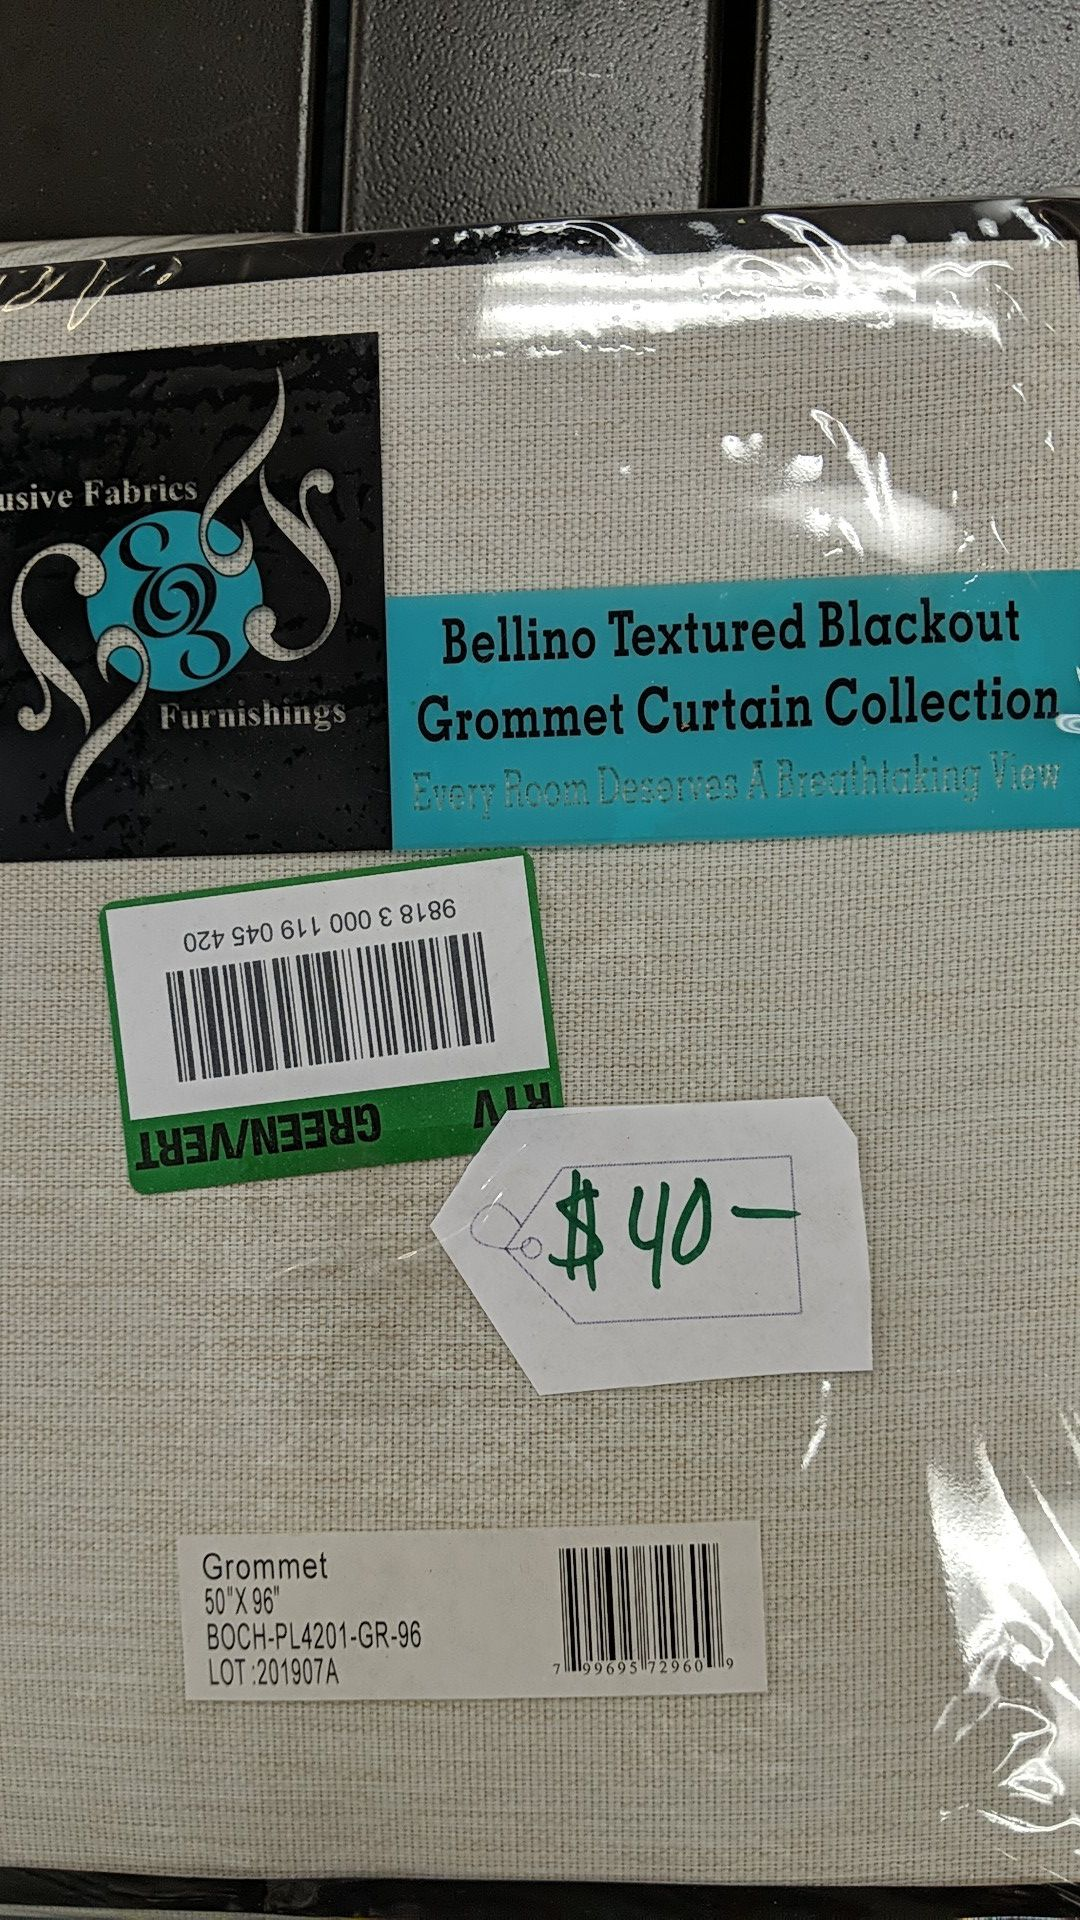 Exclusive fabrics textured blackout garment curtains